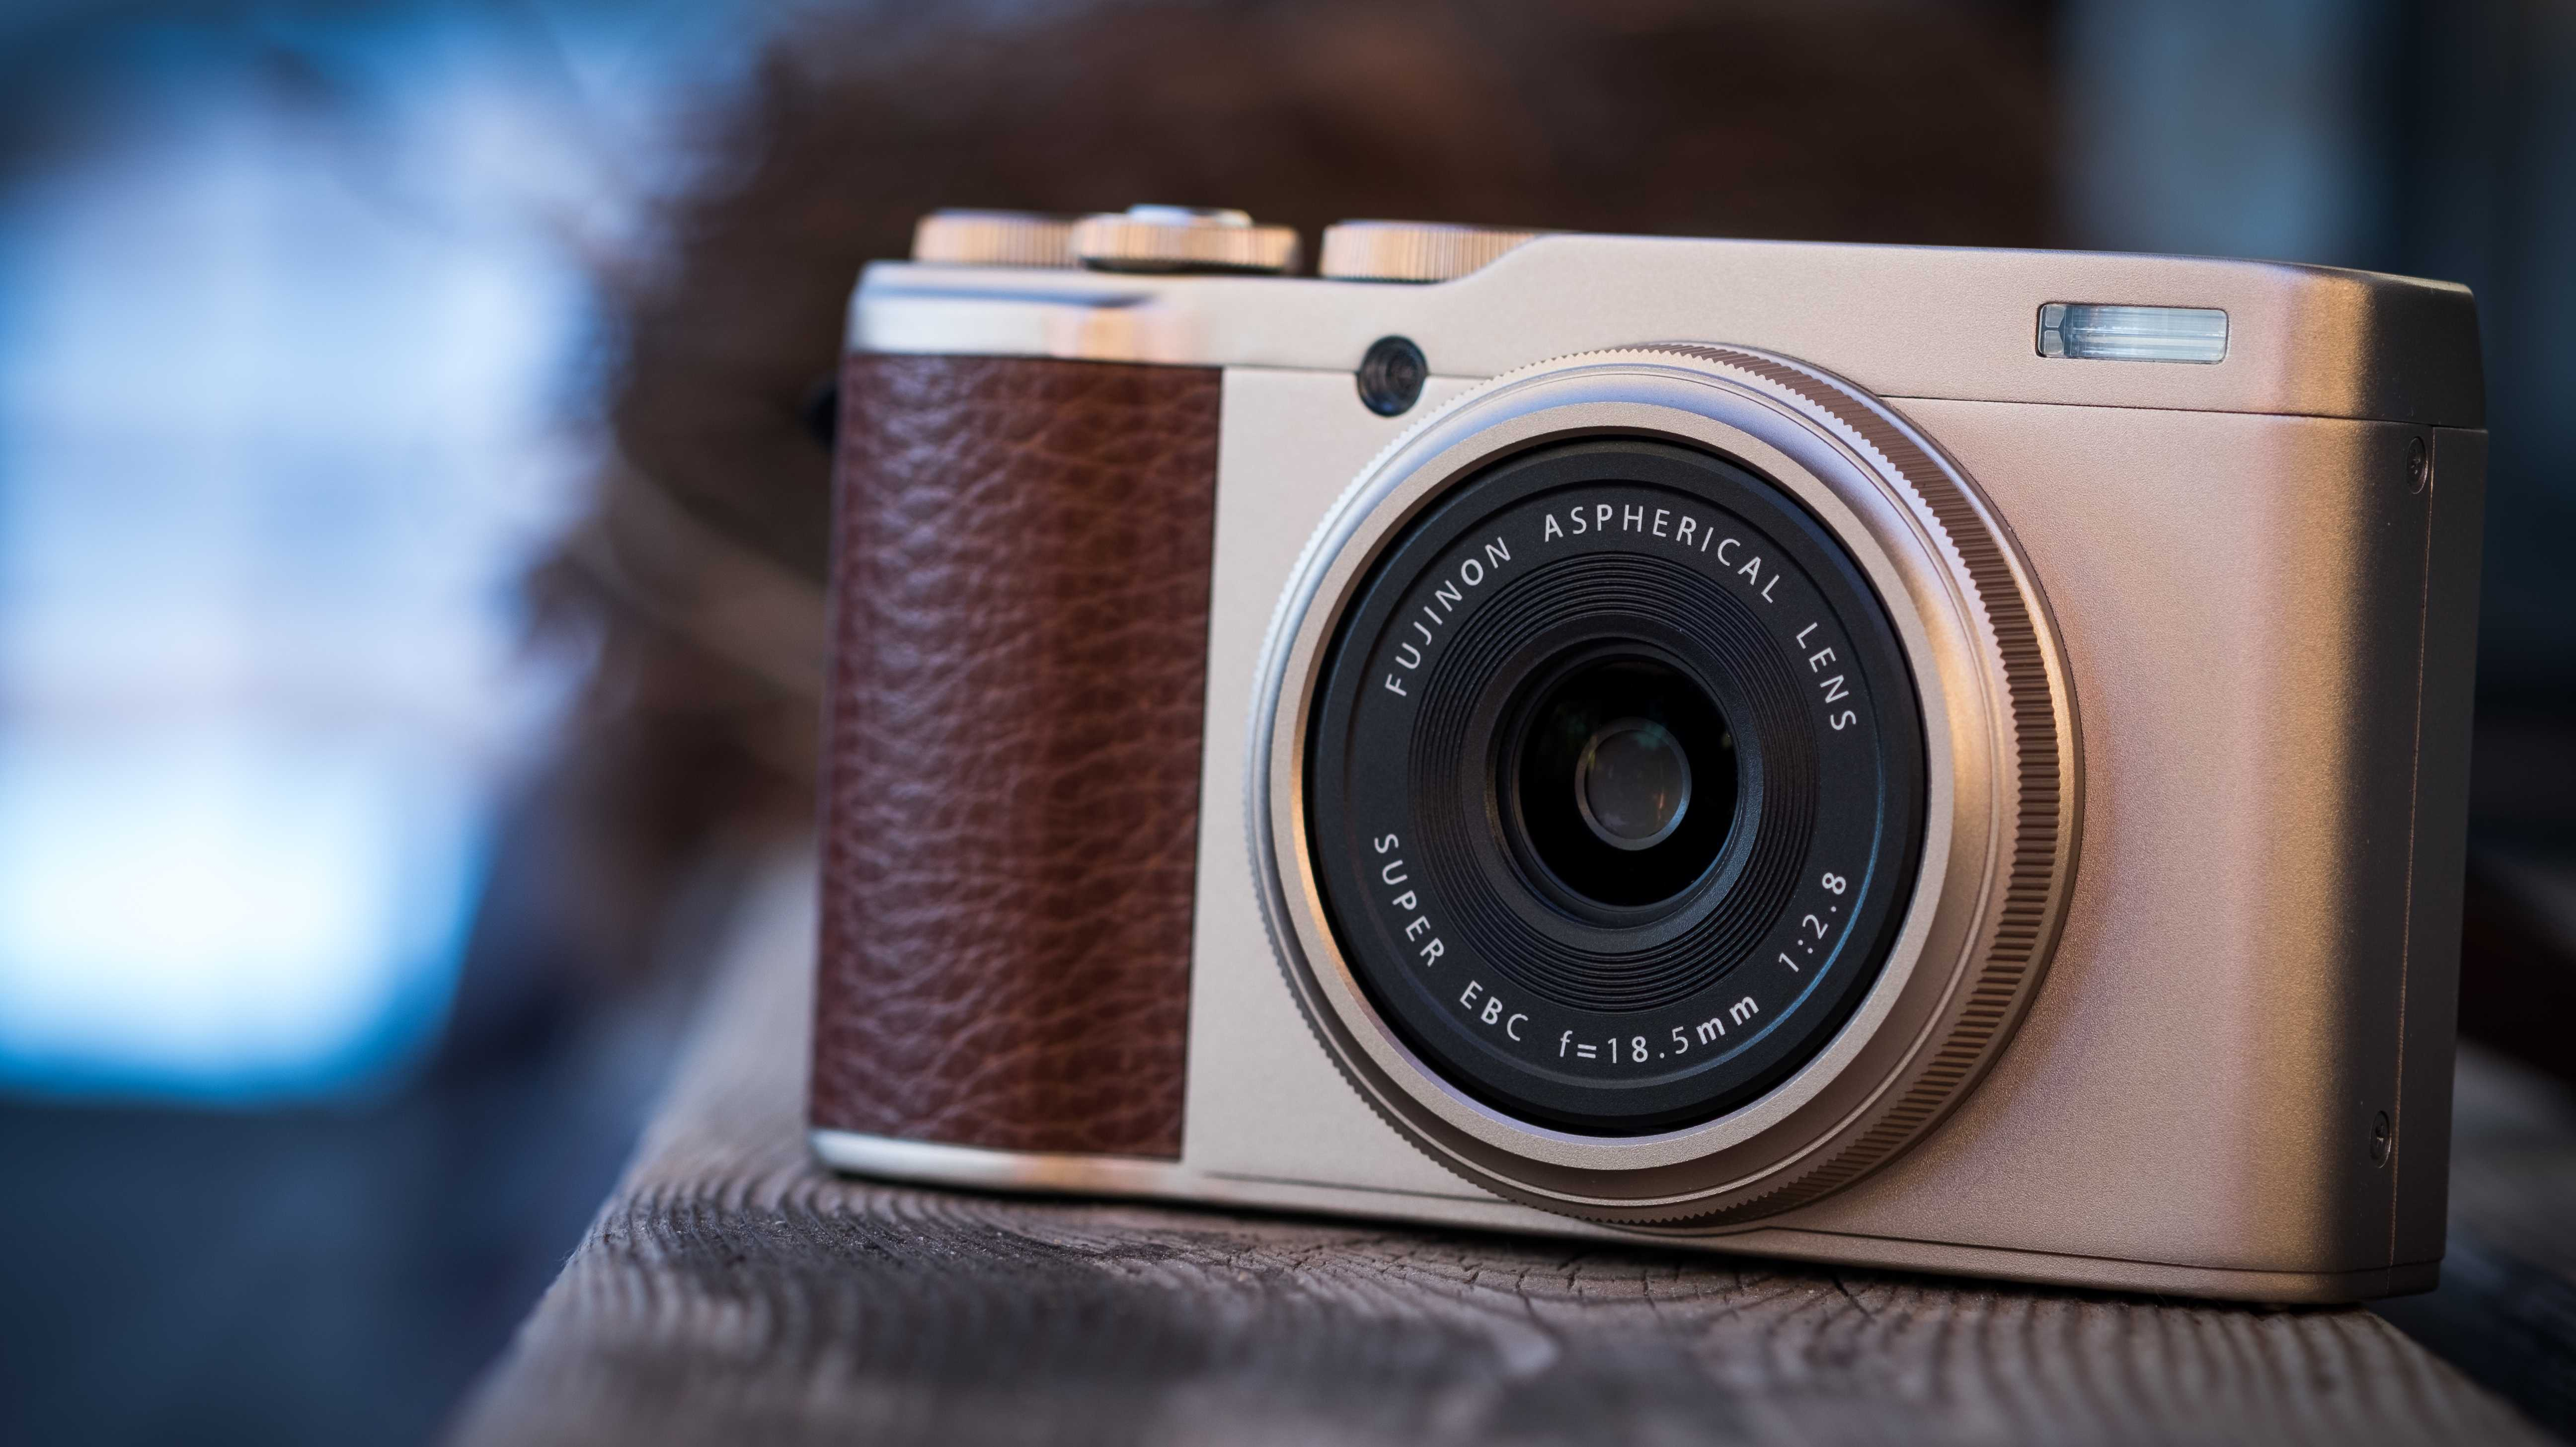 APS-C und Festbrennweite: Fujifilm kündigt Edelkompaktkamera XF10 an